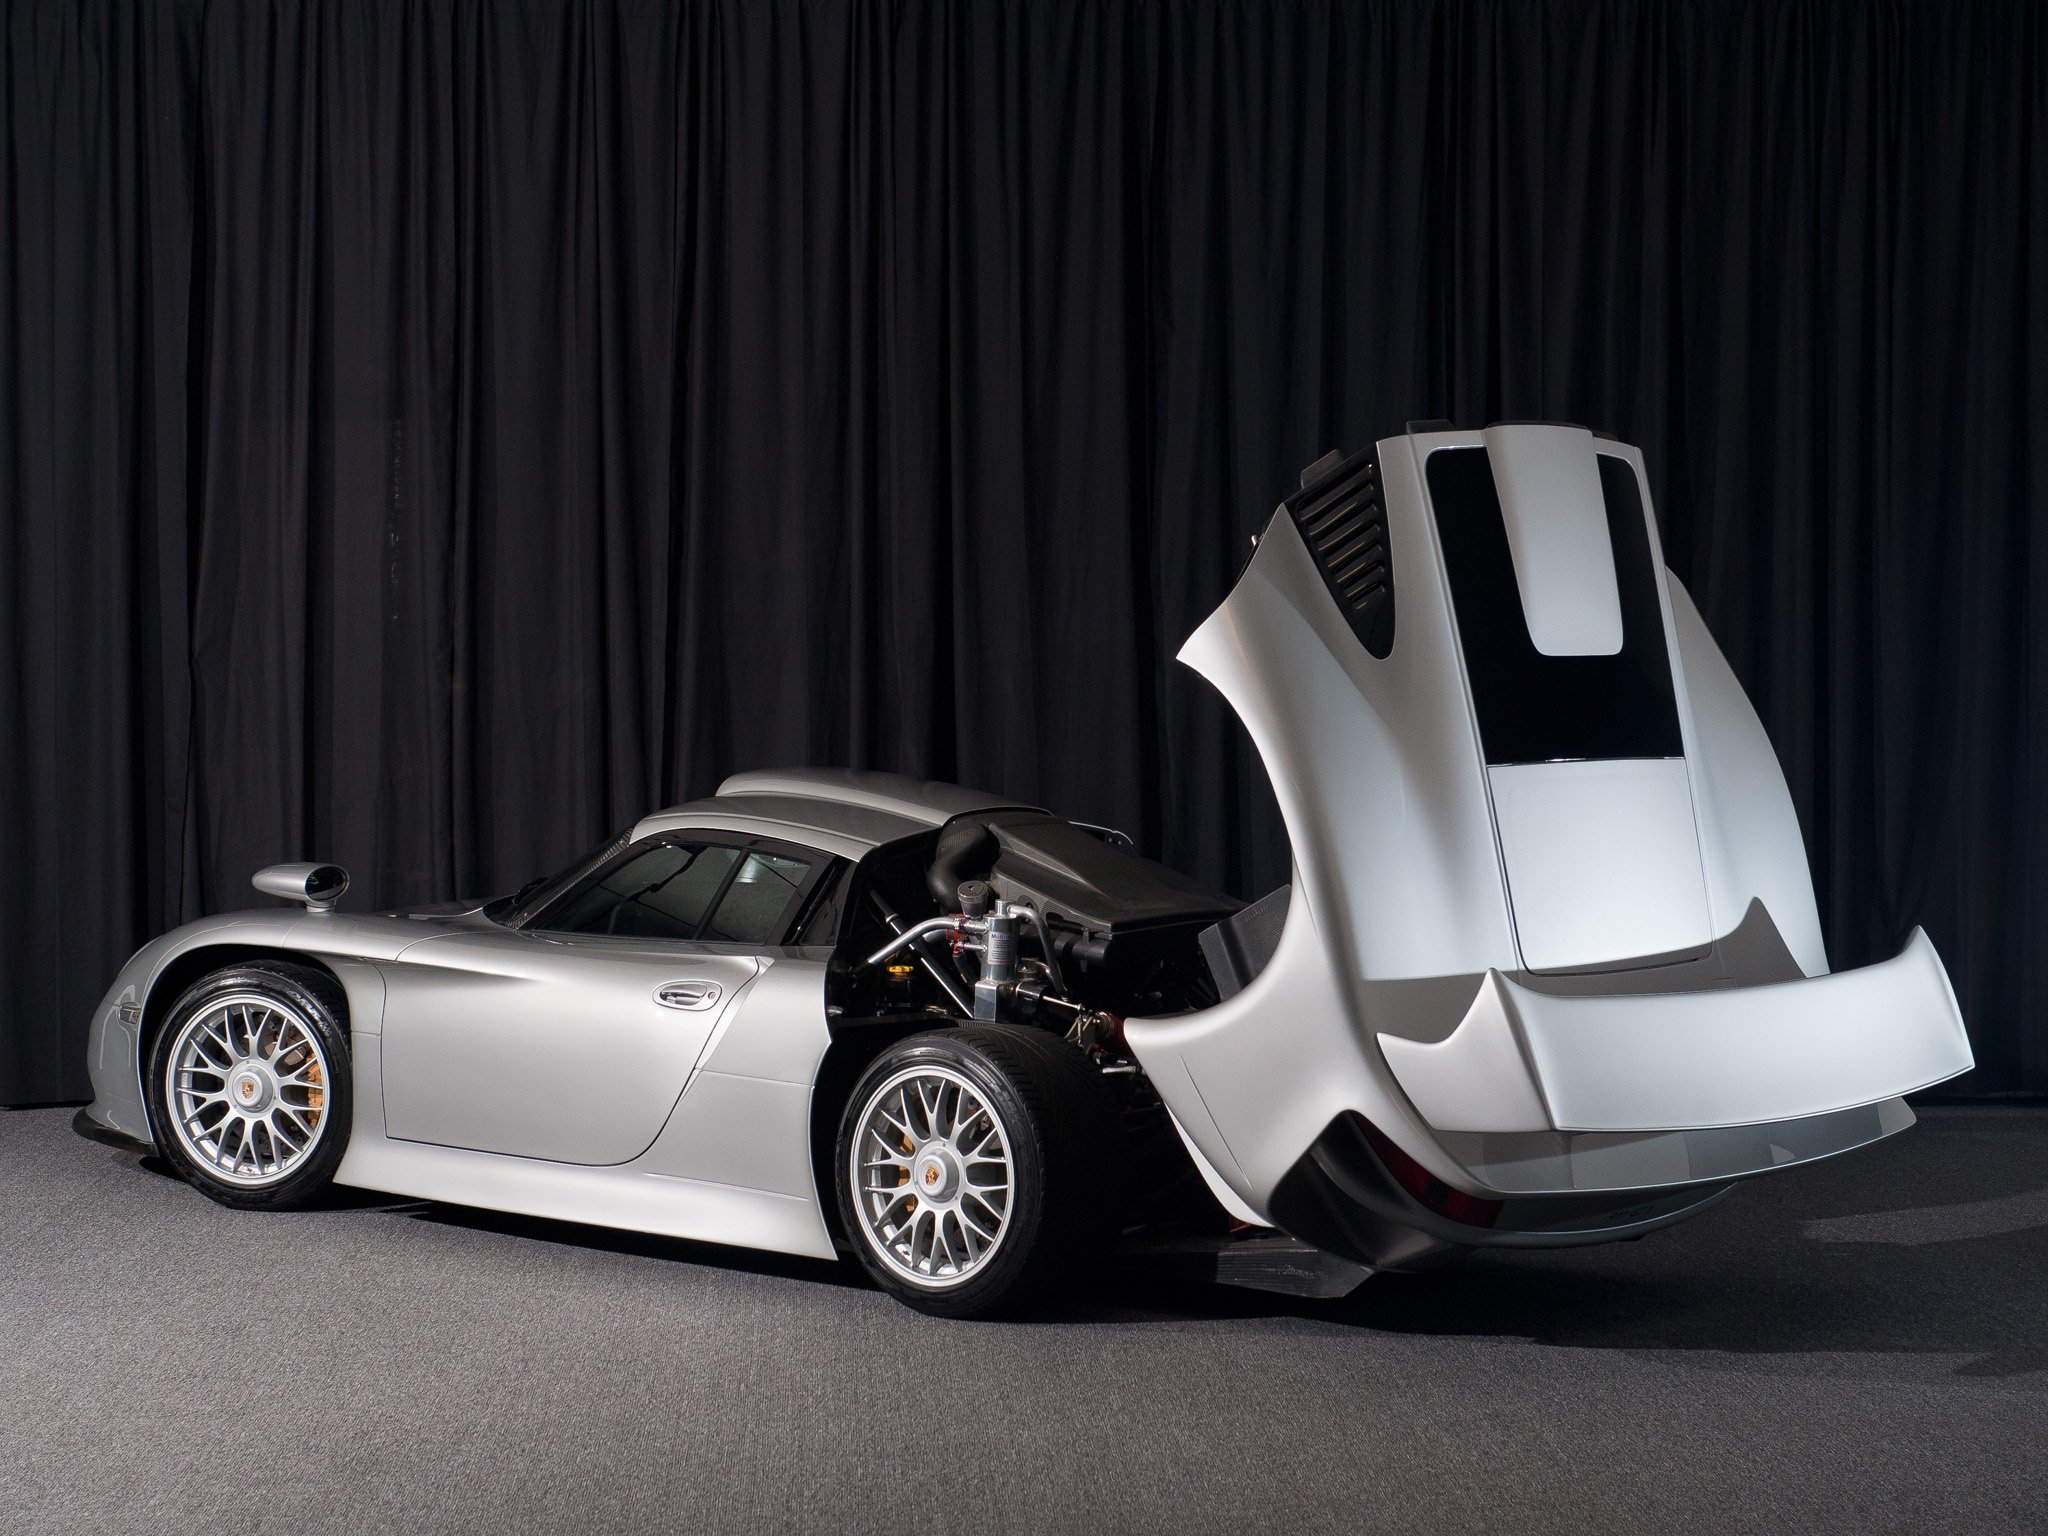 1997 porsche 911 gt1 strassenversion 996 race racing supercar engine bg wallpaper 2048x1536. Black Bedroom Furniture Sets. Home Design Ideas